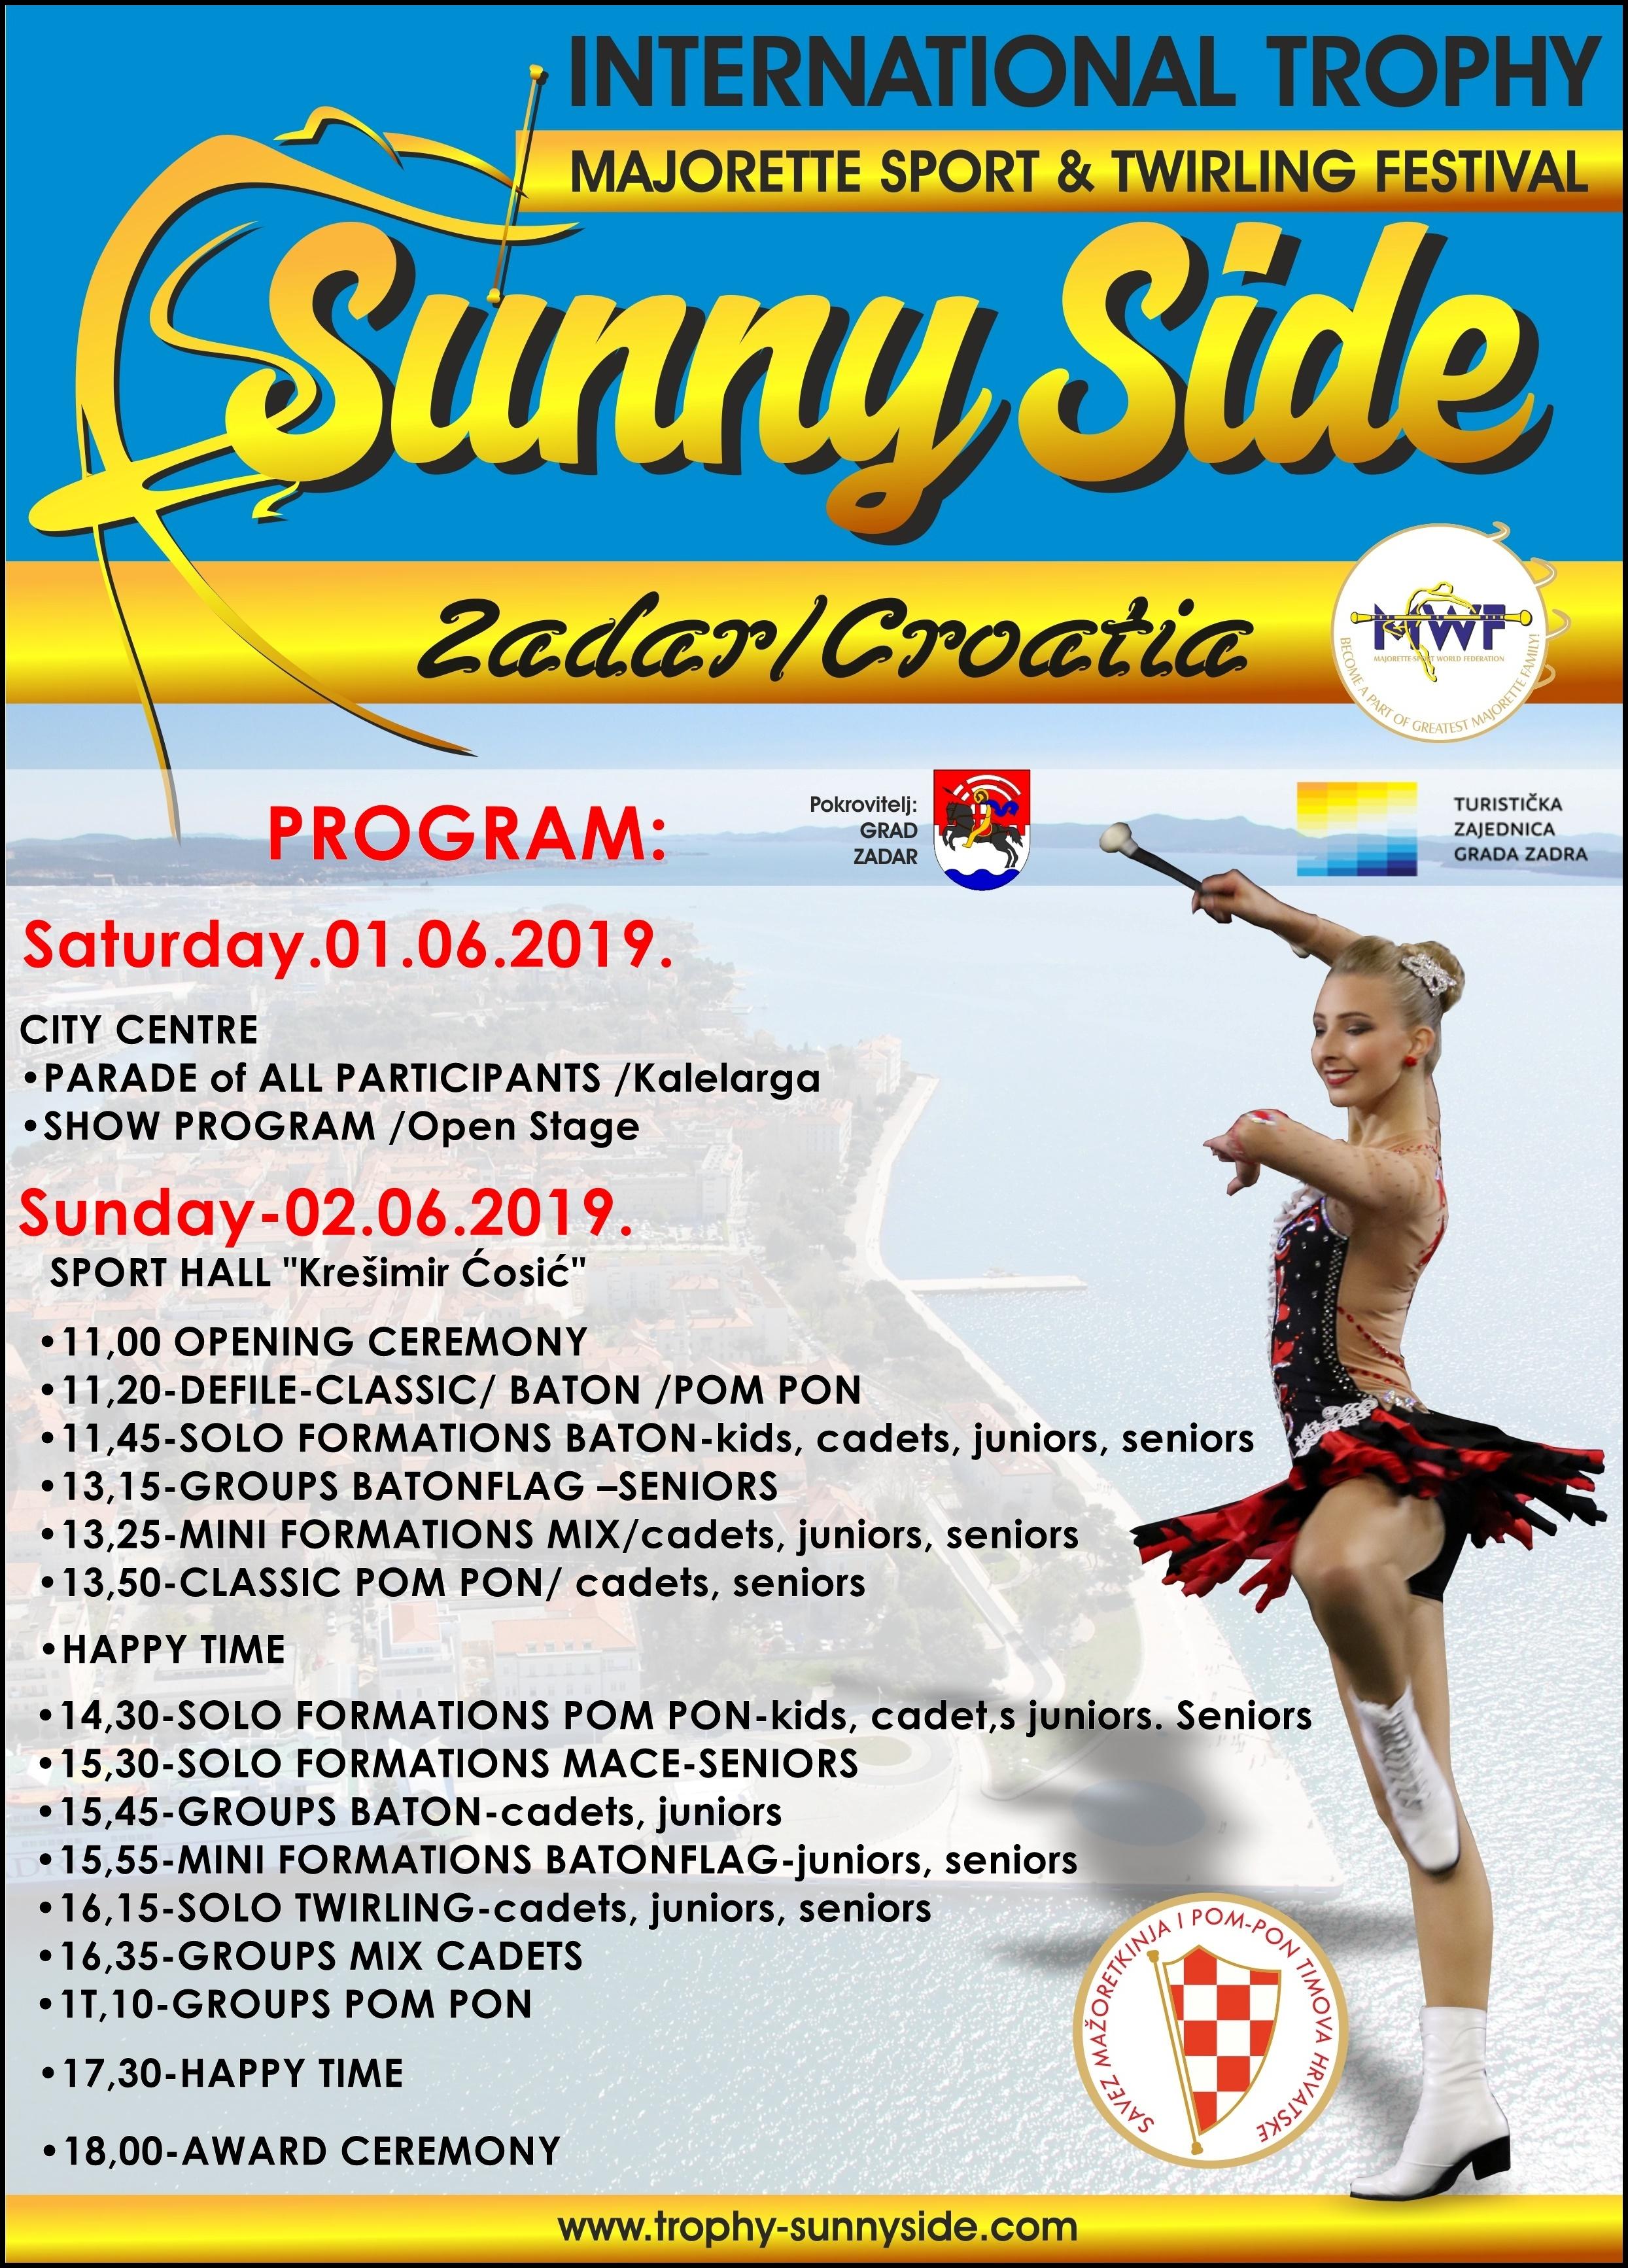 I. International trophy sunny side međunarodni festival mažoret sporta i twirlinga